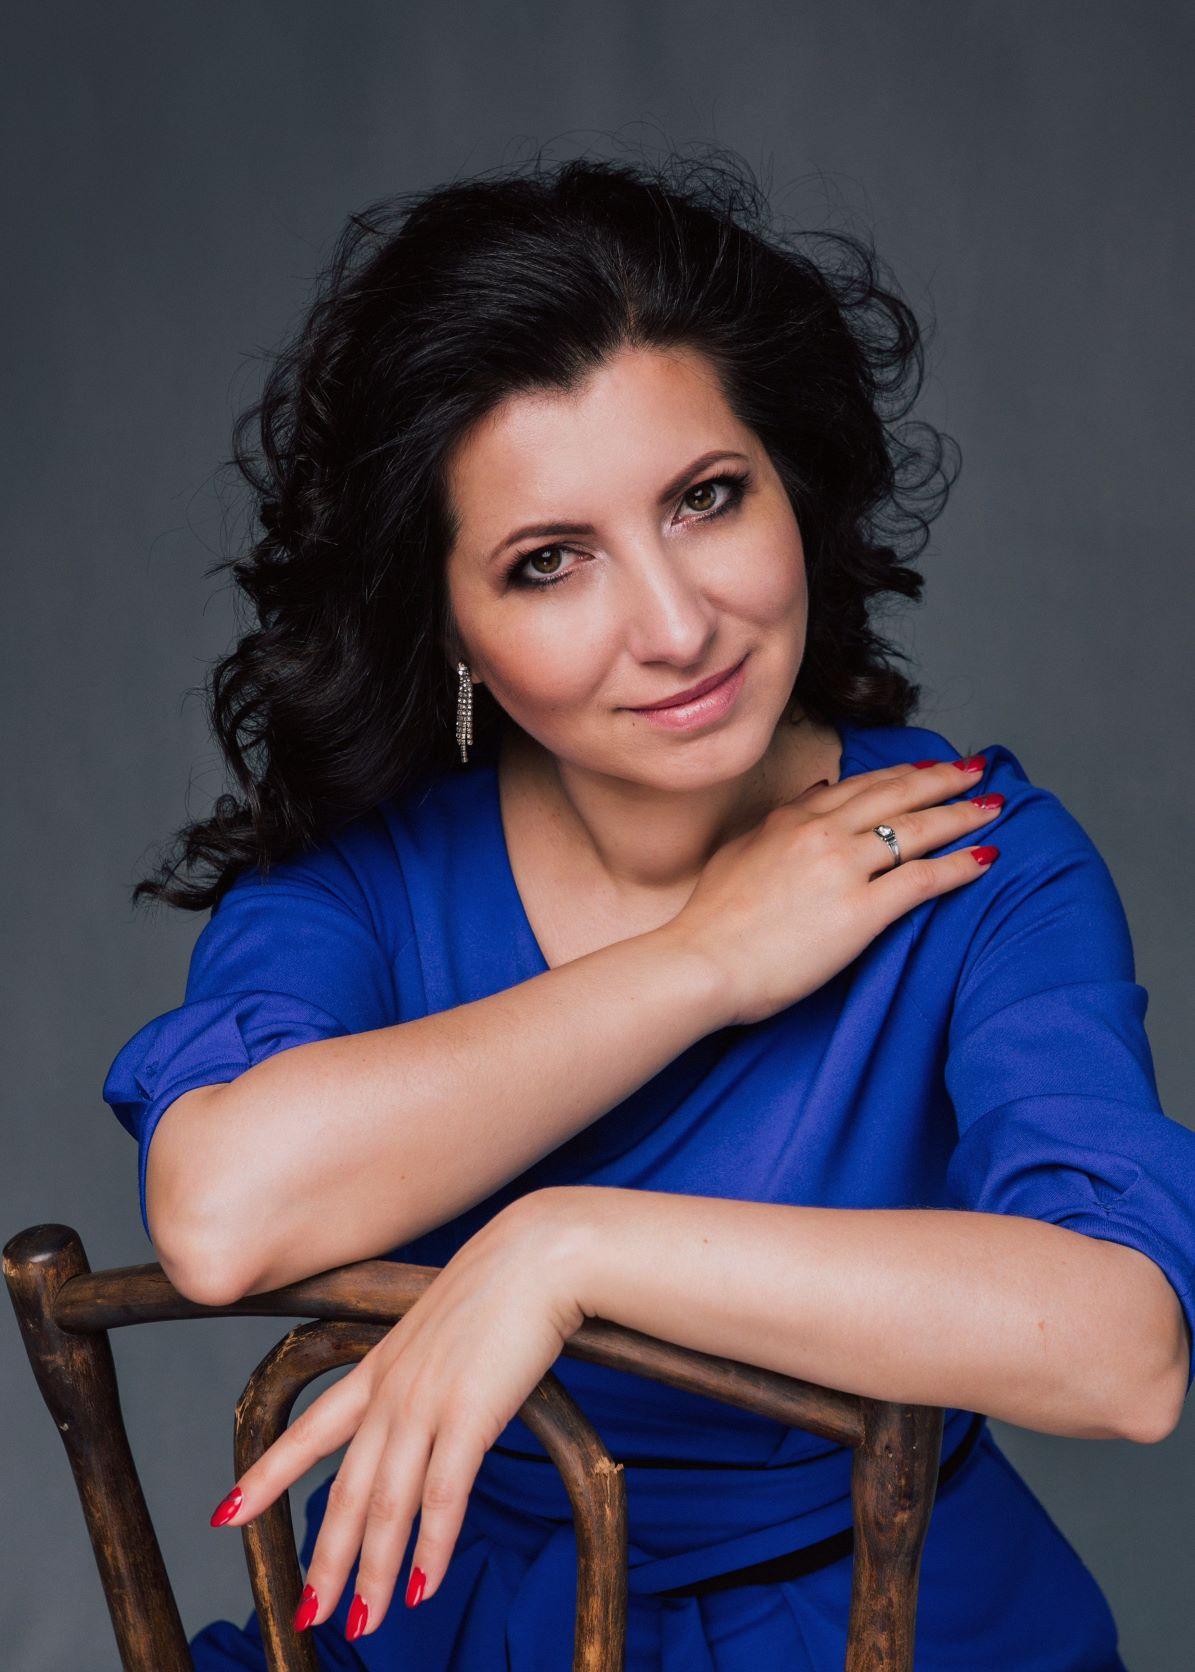 Zoya Tsererina - Picture nr #1